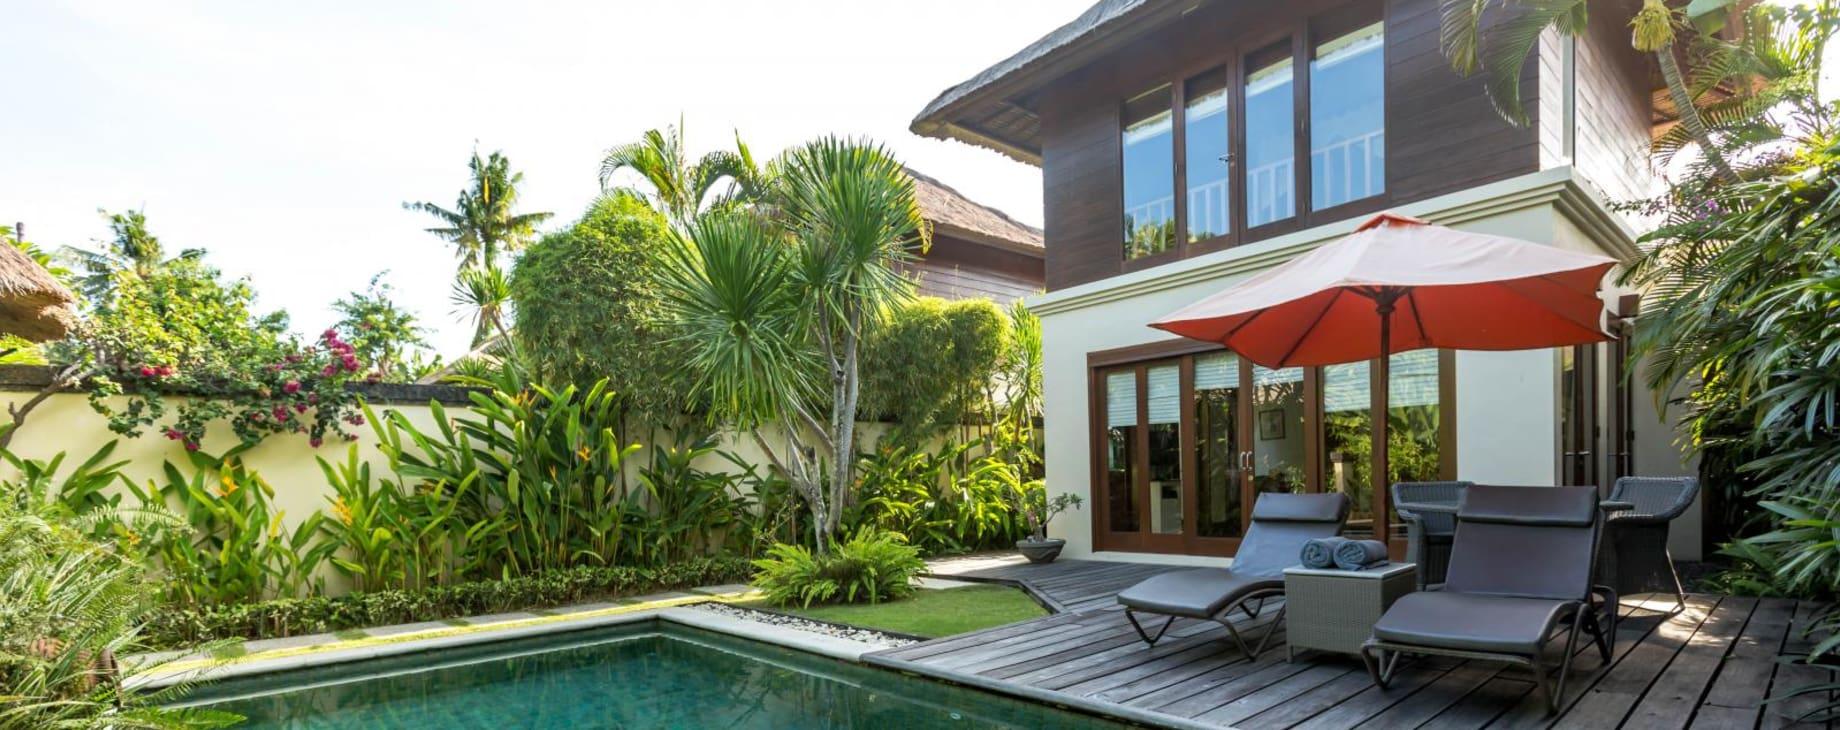 Luxury Honeymoon Pool Villa